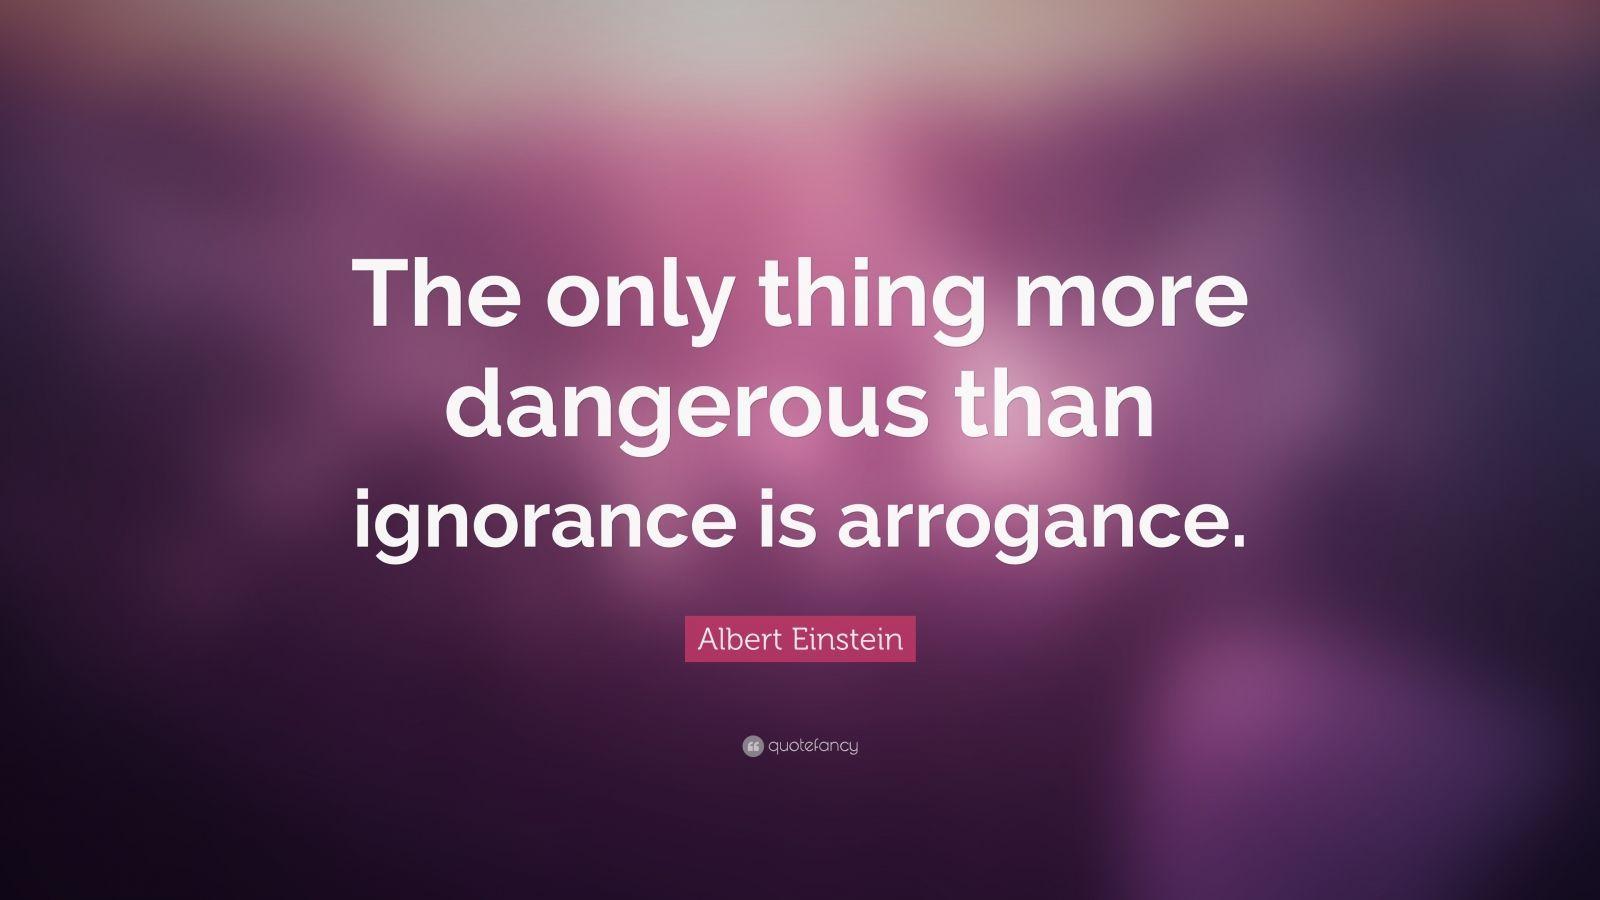 Albert Einstein Quote The Only Thing More Dangerous Than Ignorance Is Arrogance Einstein Quotes Albert Einstein Quotes Arrogance Quotes